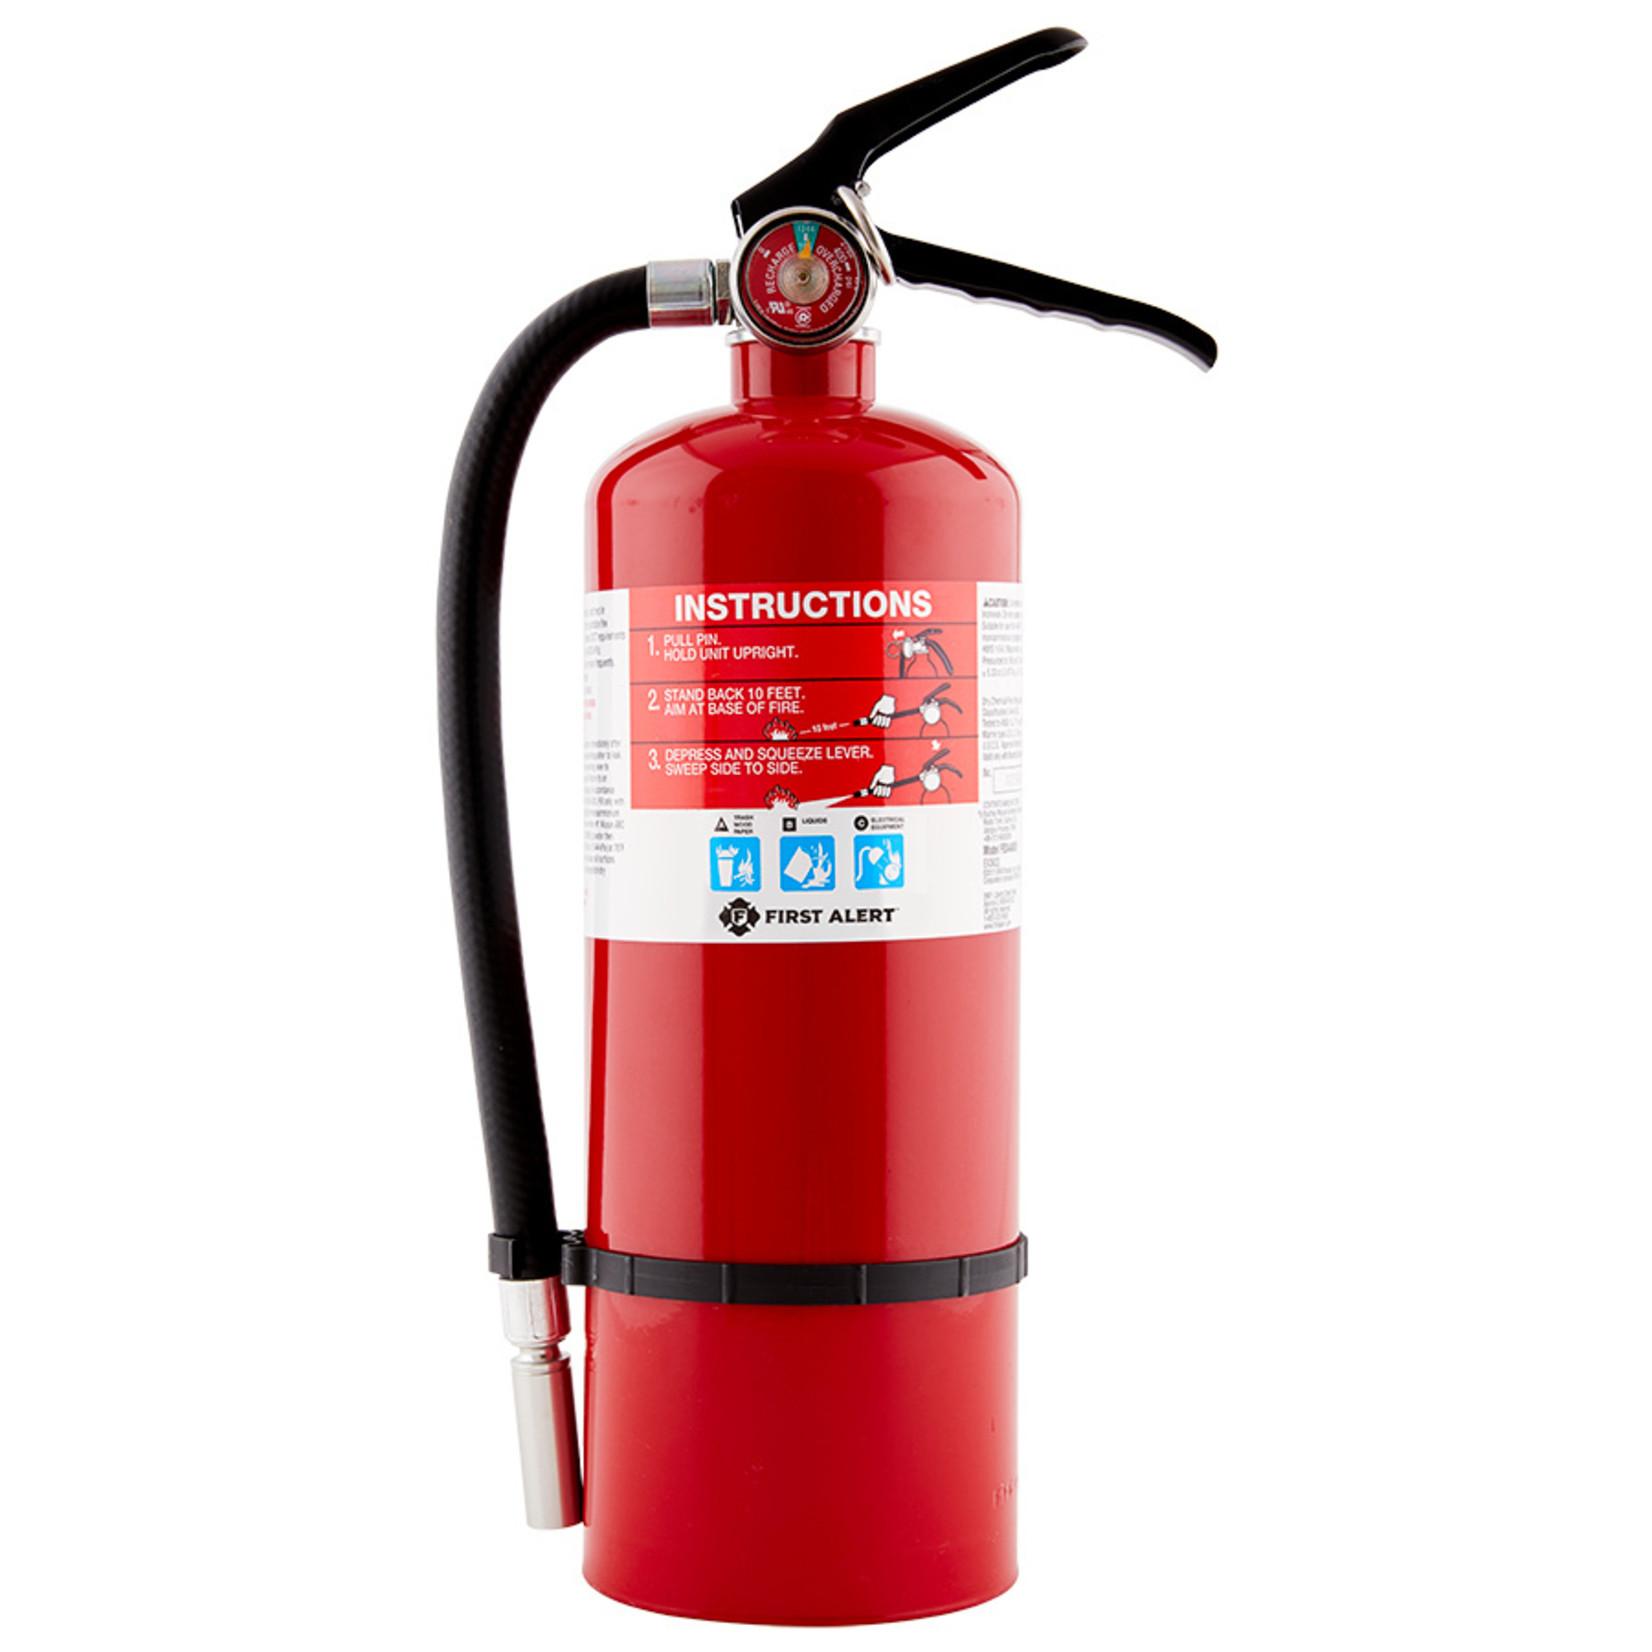 BRK BRK PRO 5lb Heavy Duty Plus Fire Extinguisher